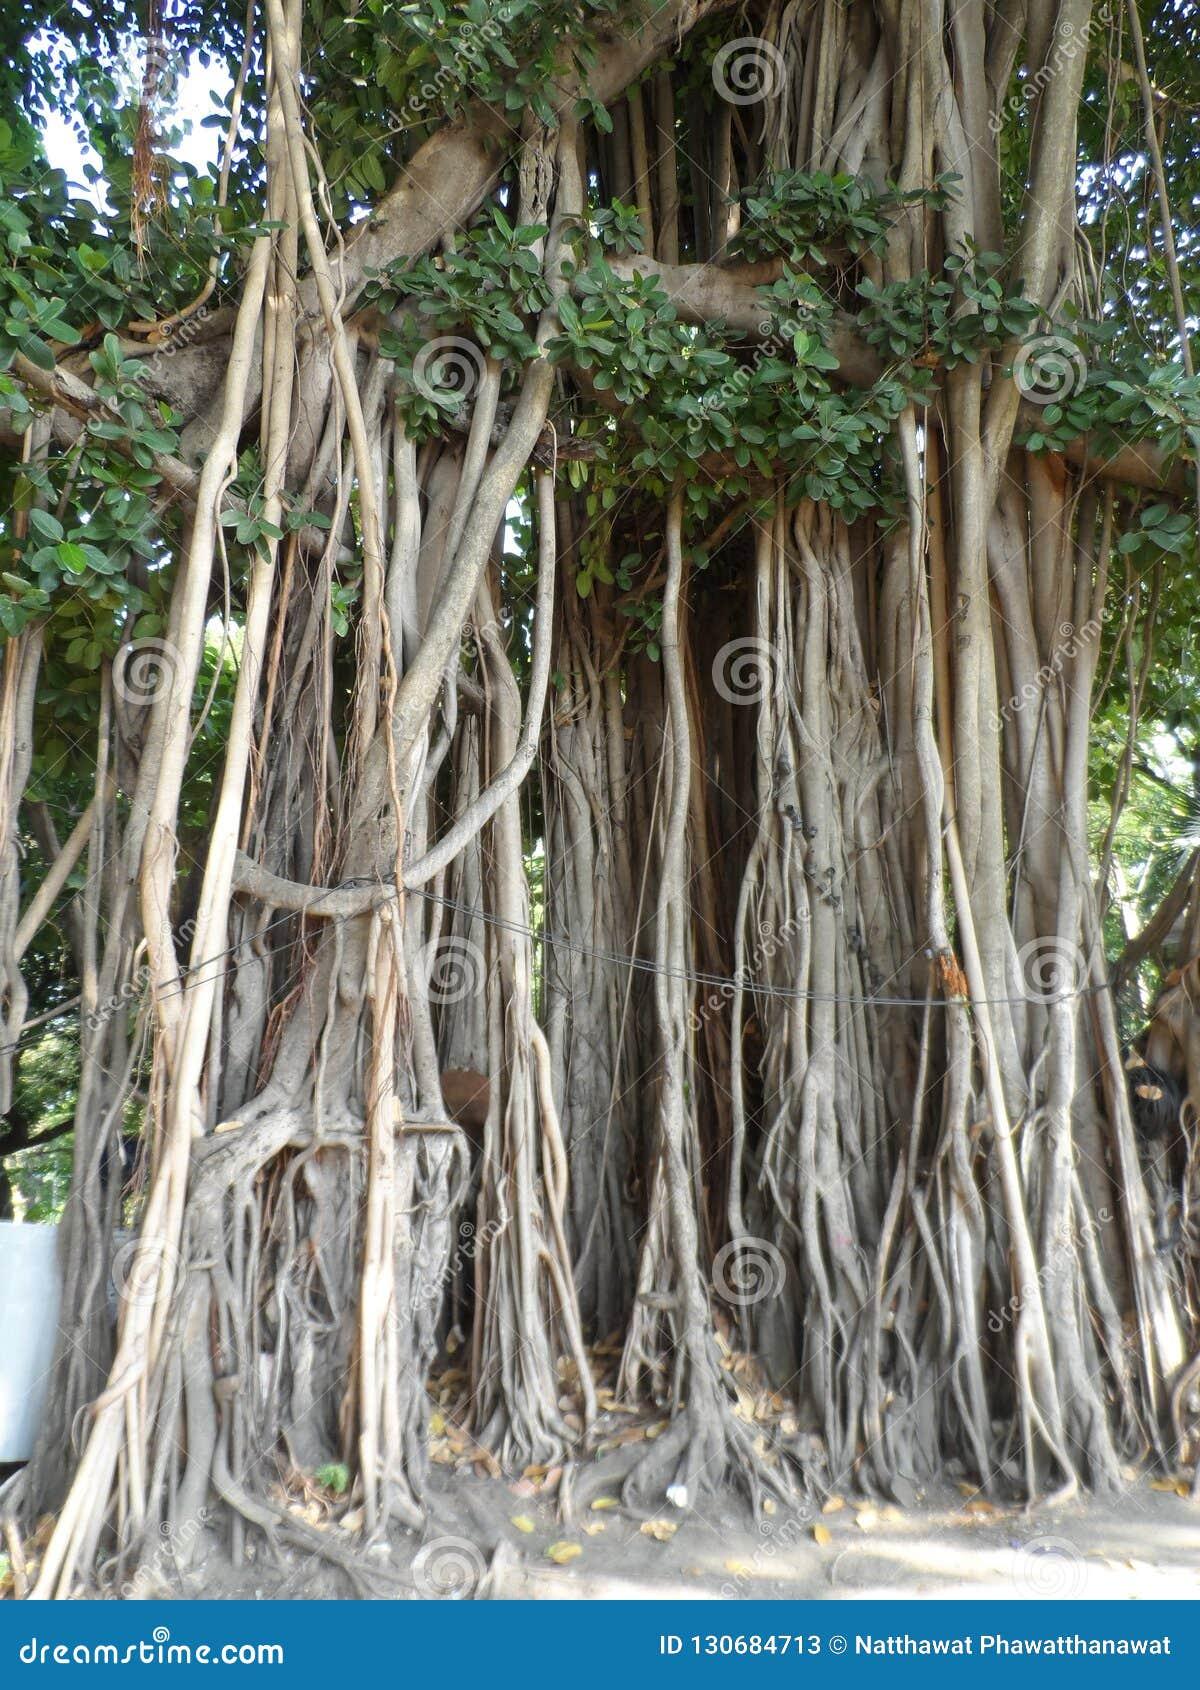 Huilend fig., Ficusboom in Bangkok Thailand